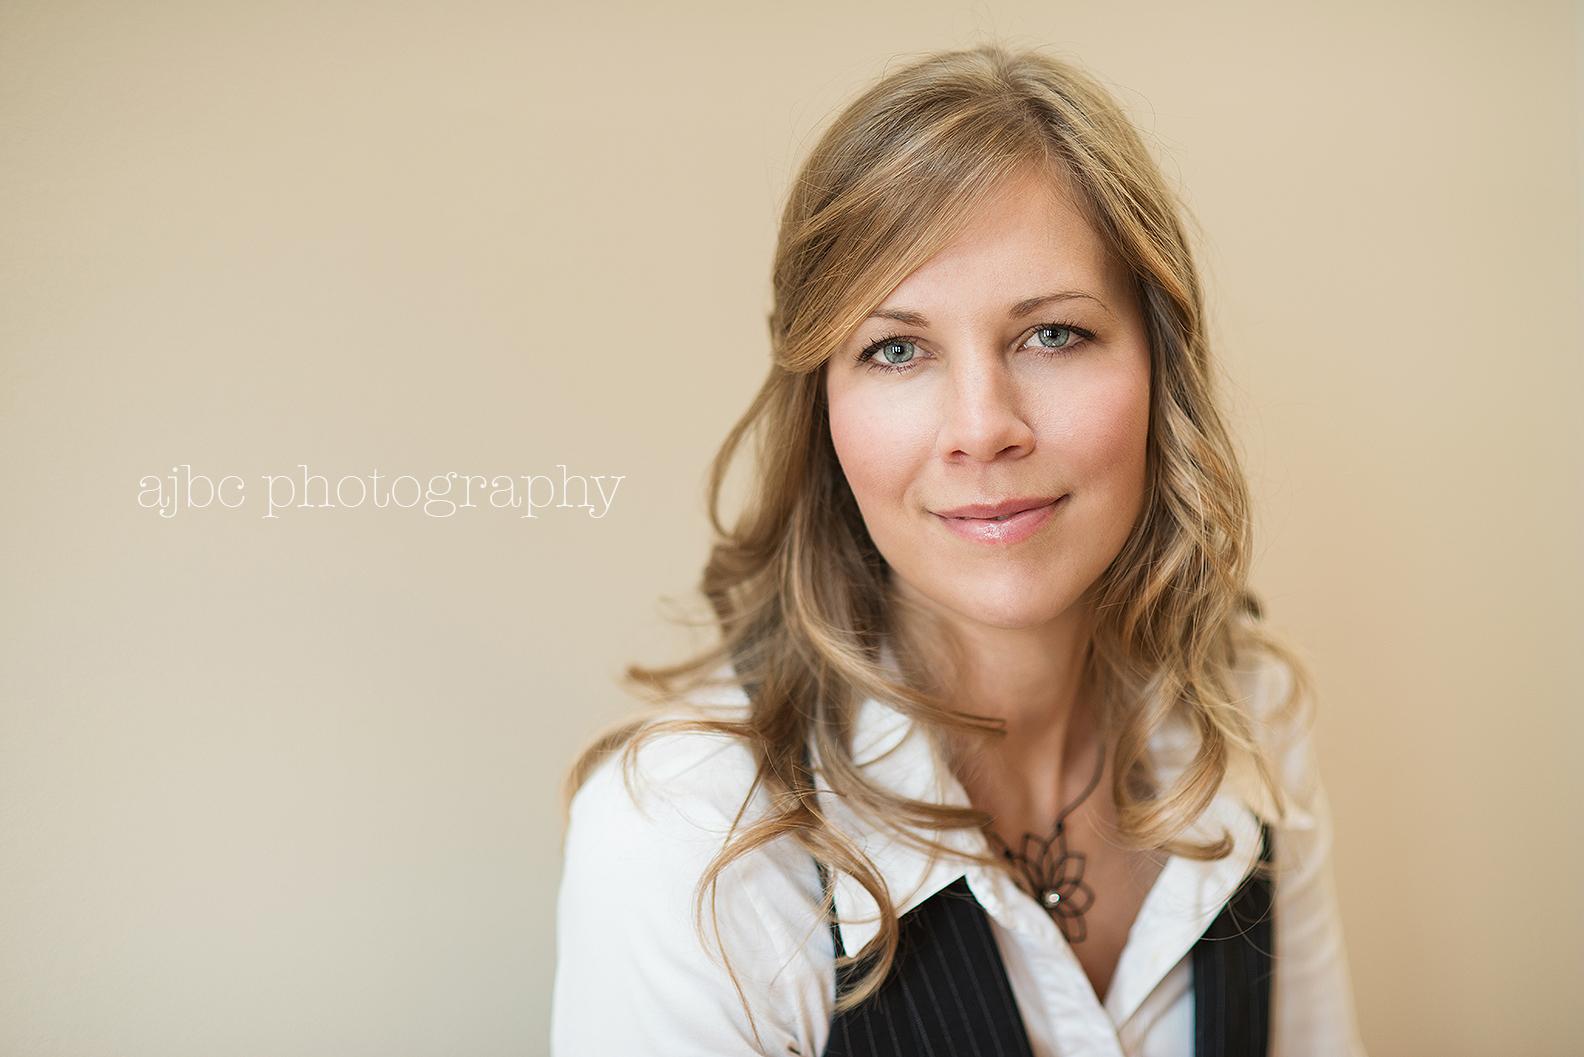 ajbcphotography-port-huron-michigan-health-coach-photgrapher-headshot-business